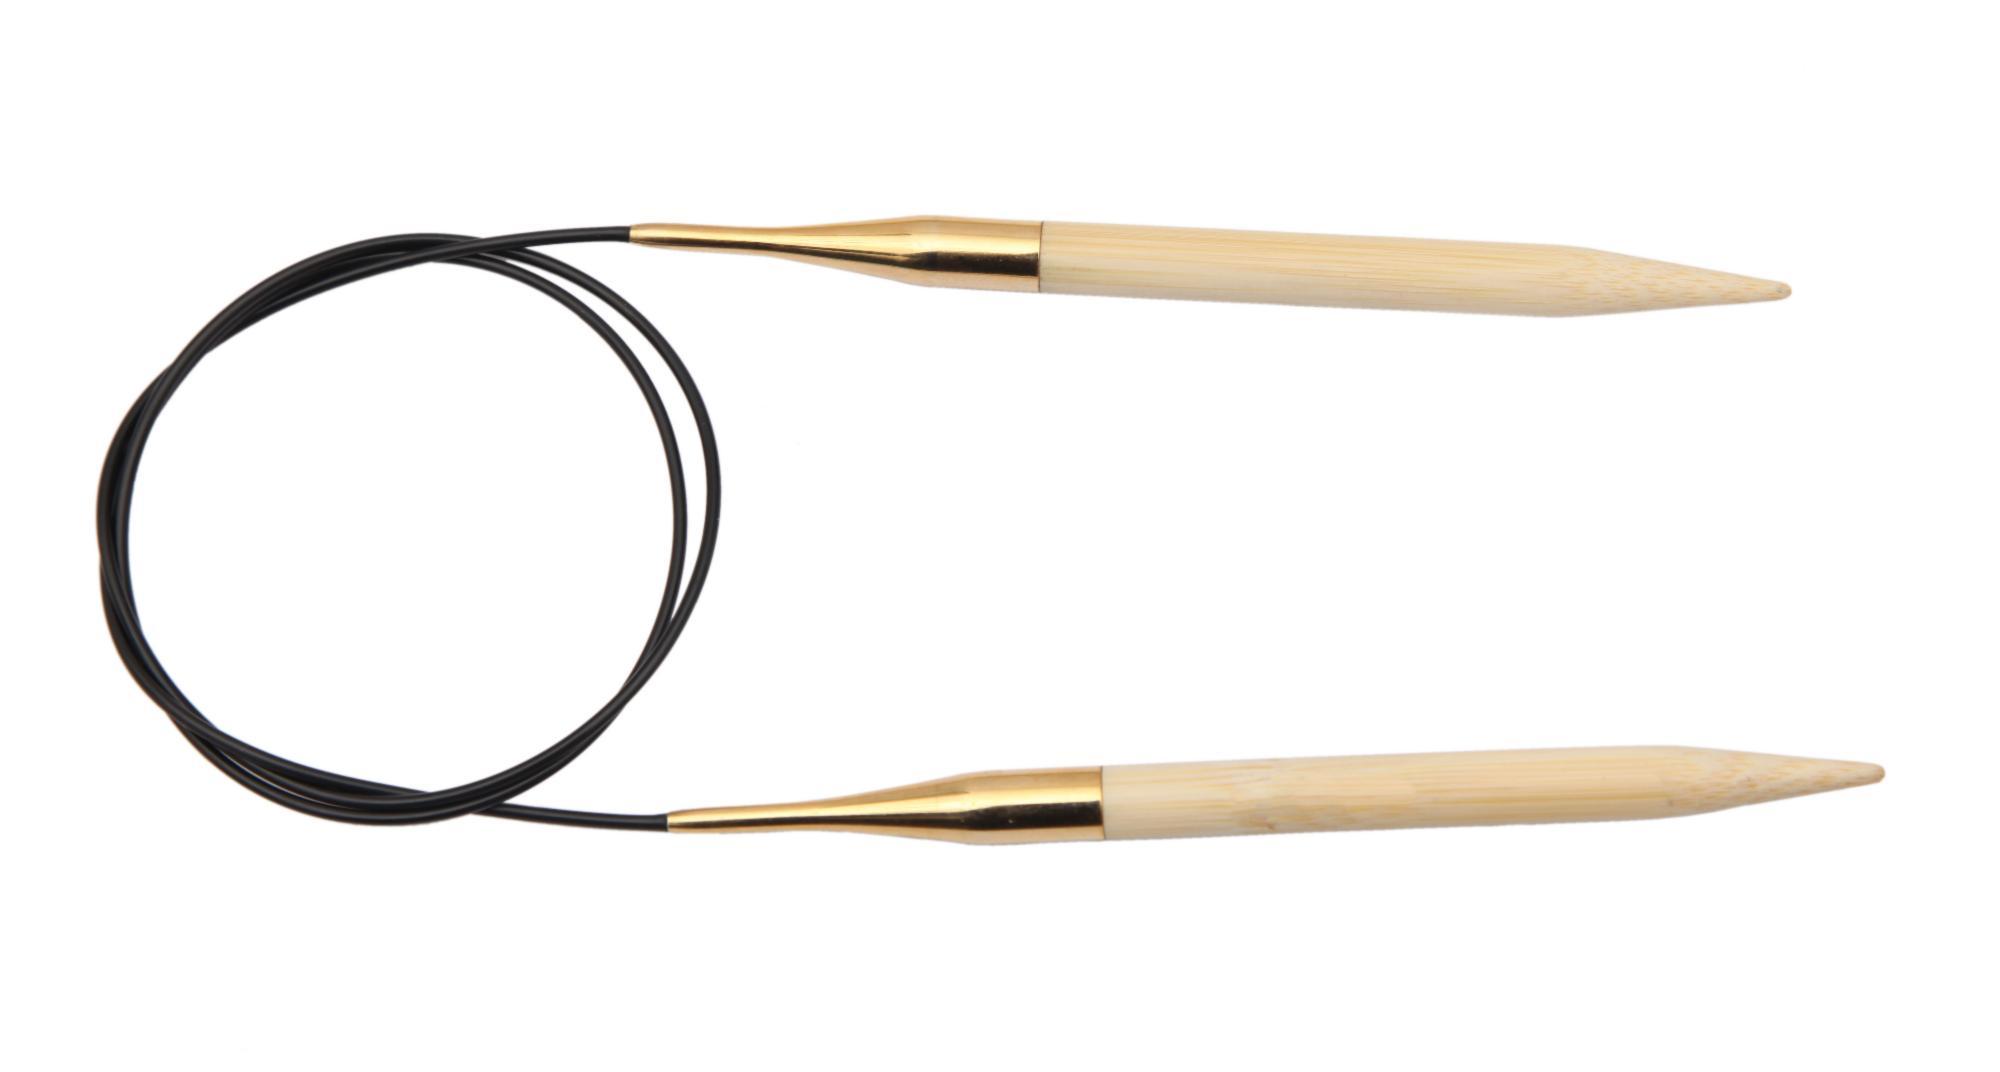 Спицы круговые 60 см Bamboo KnitPro, 22224, 2.75 мм